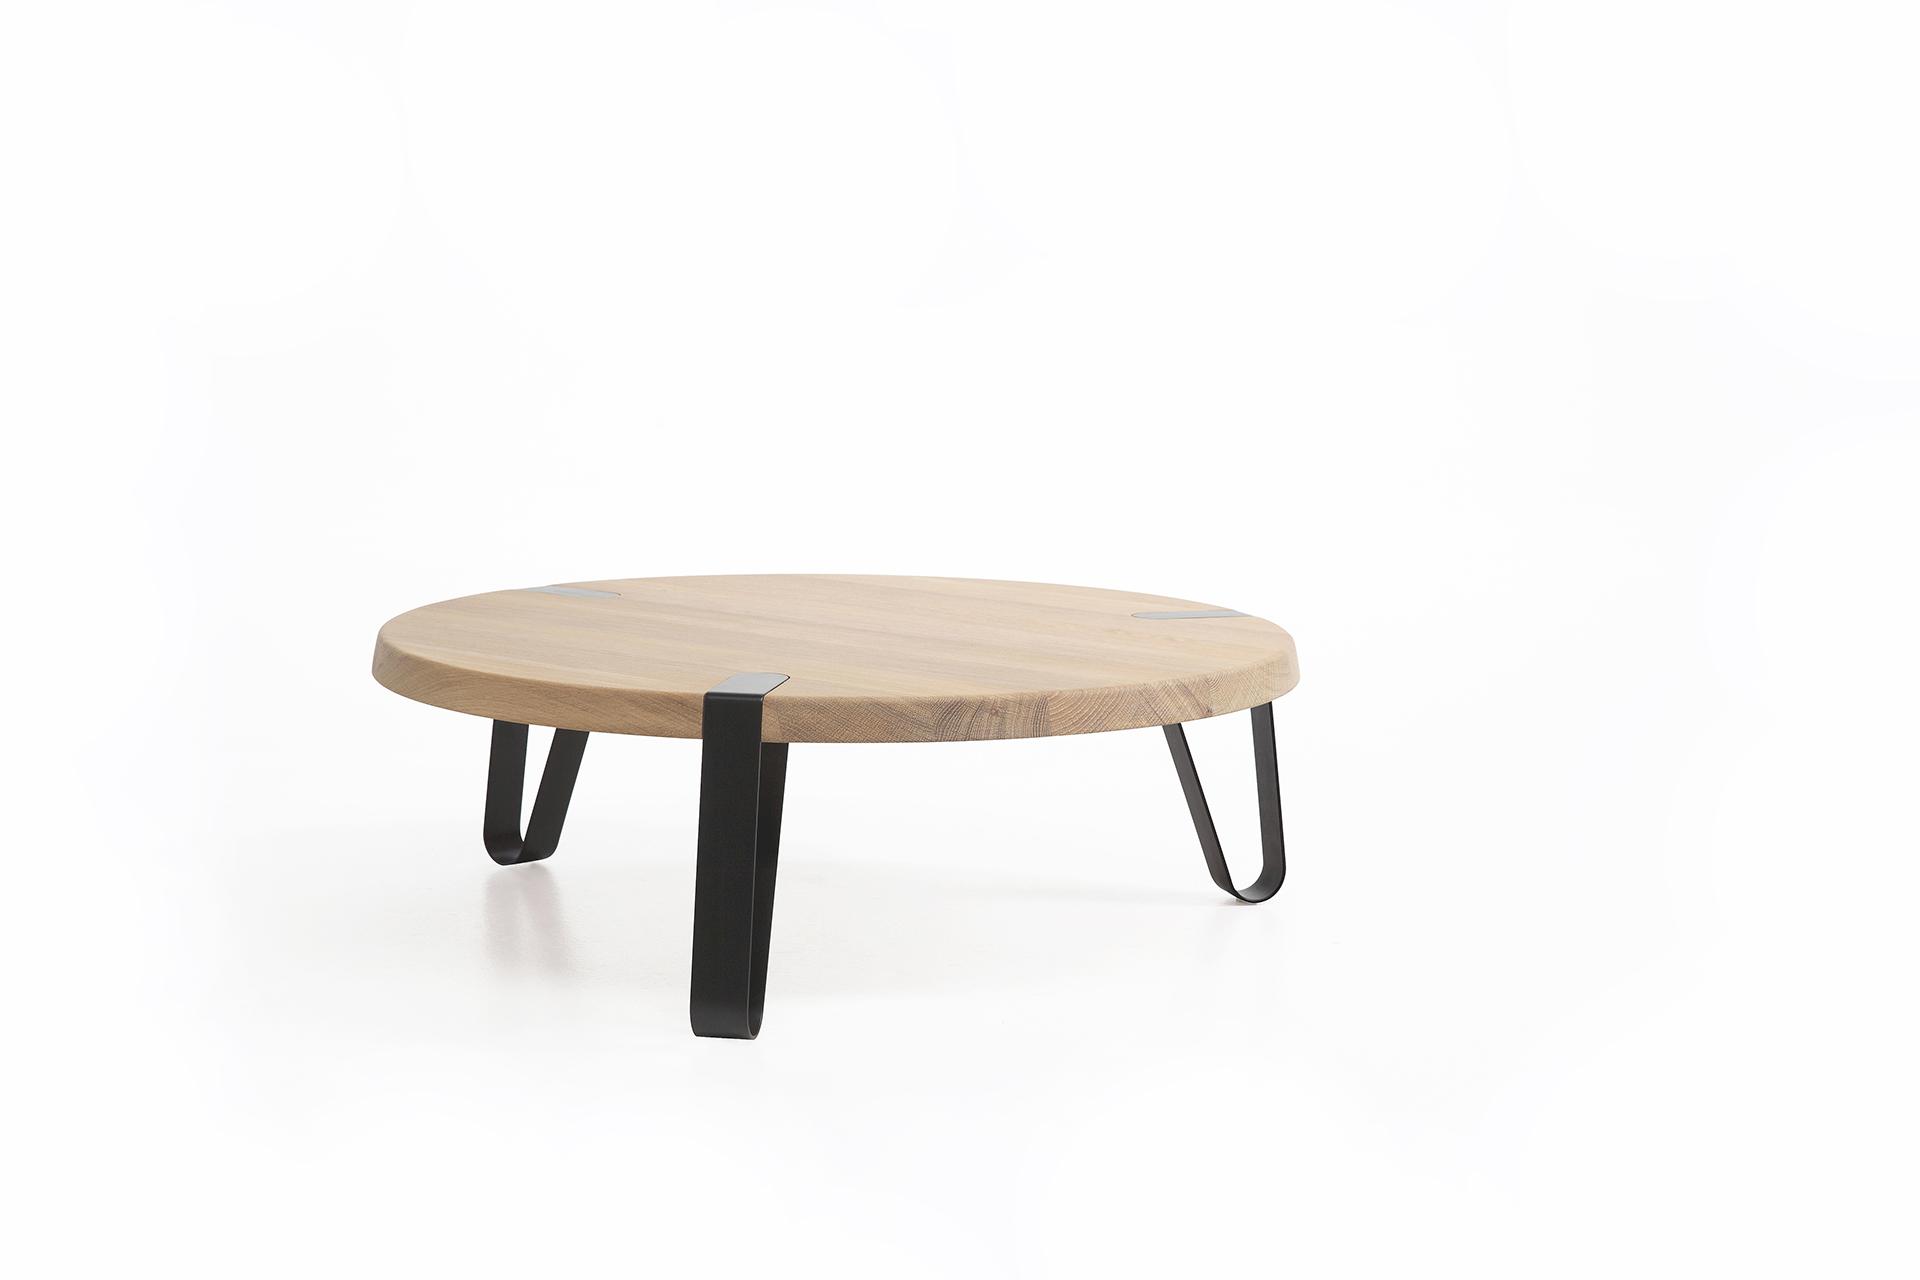 White Oak Salontafel.Level Round Design Coffeetable L Erik Remmers L Odesi Your Dutch Design